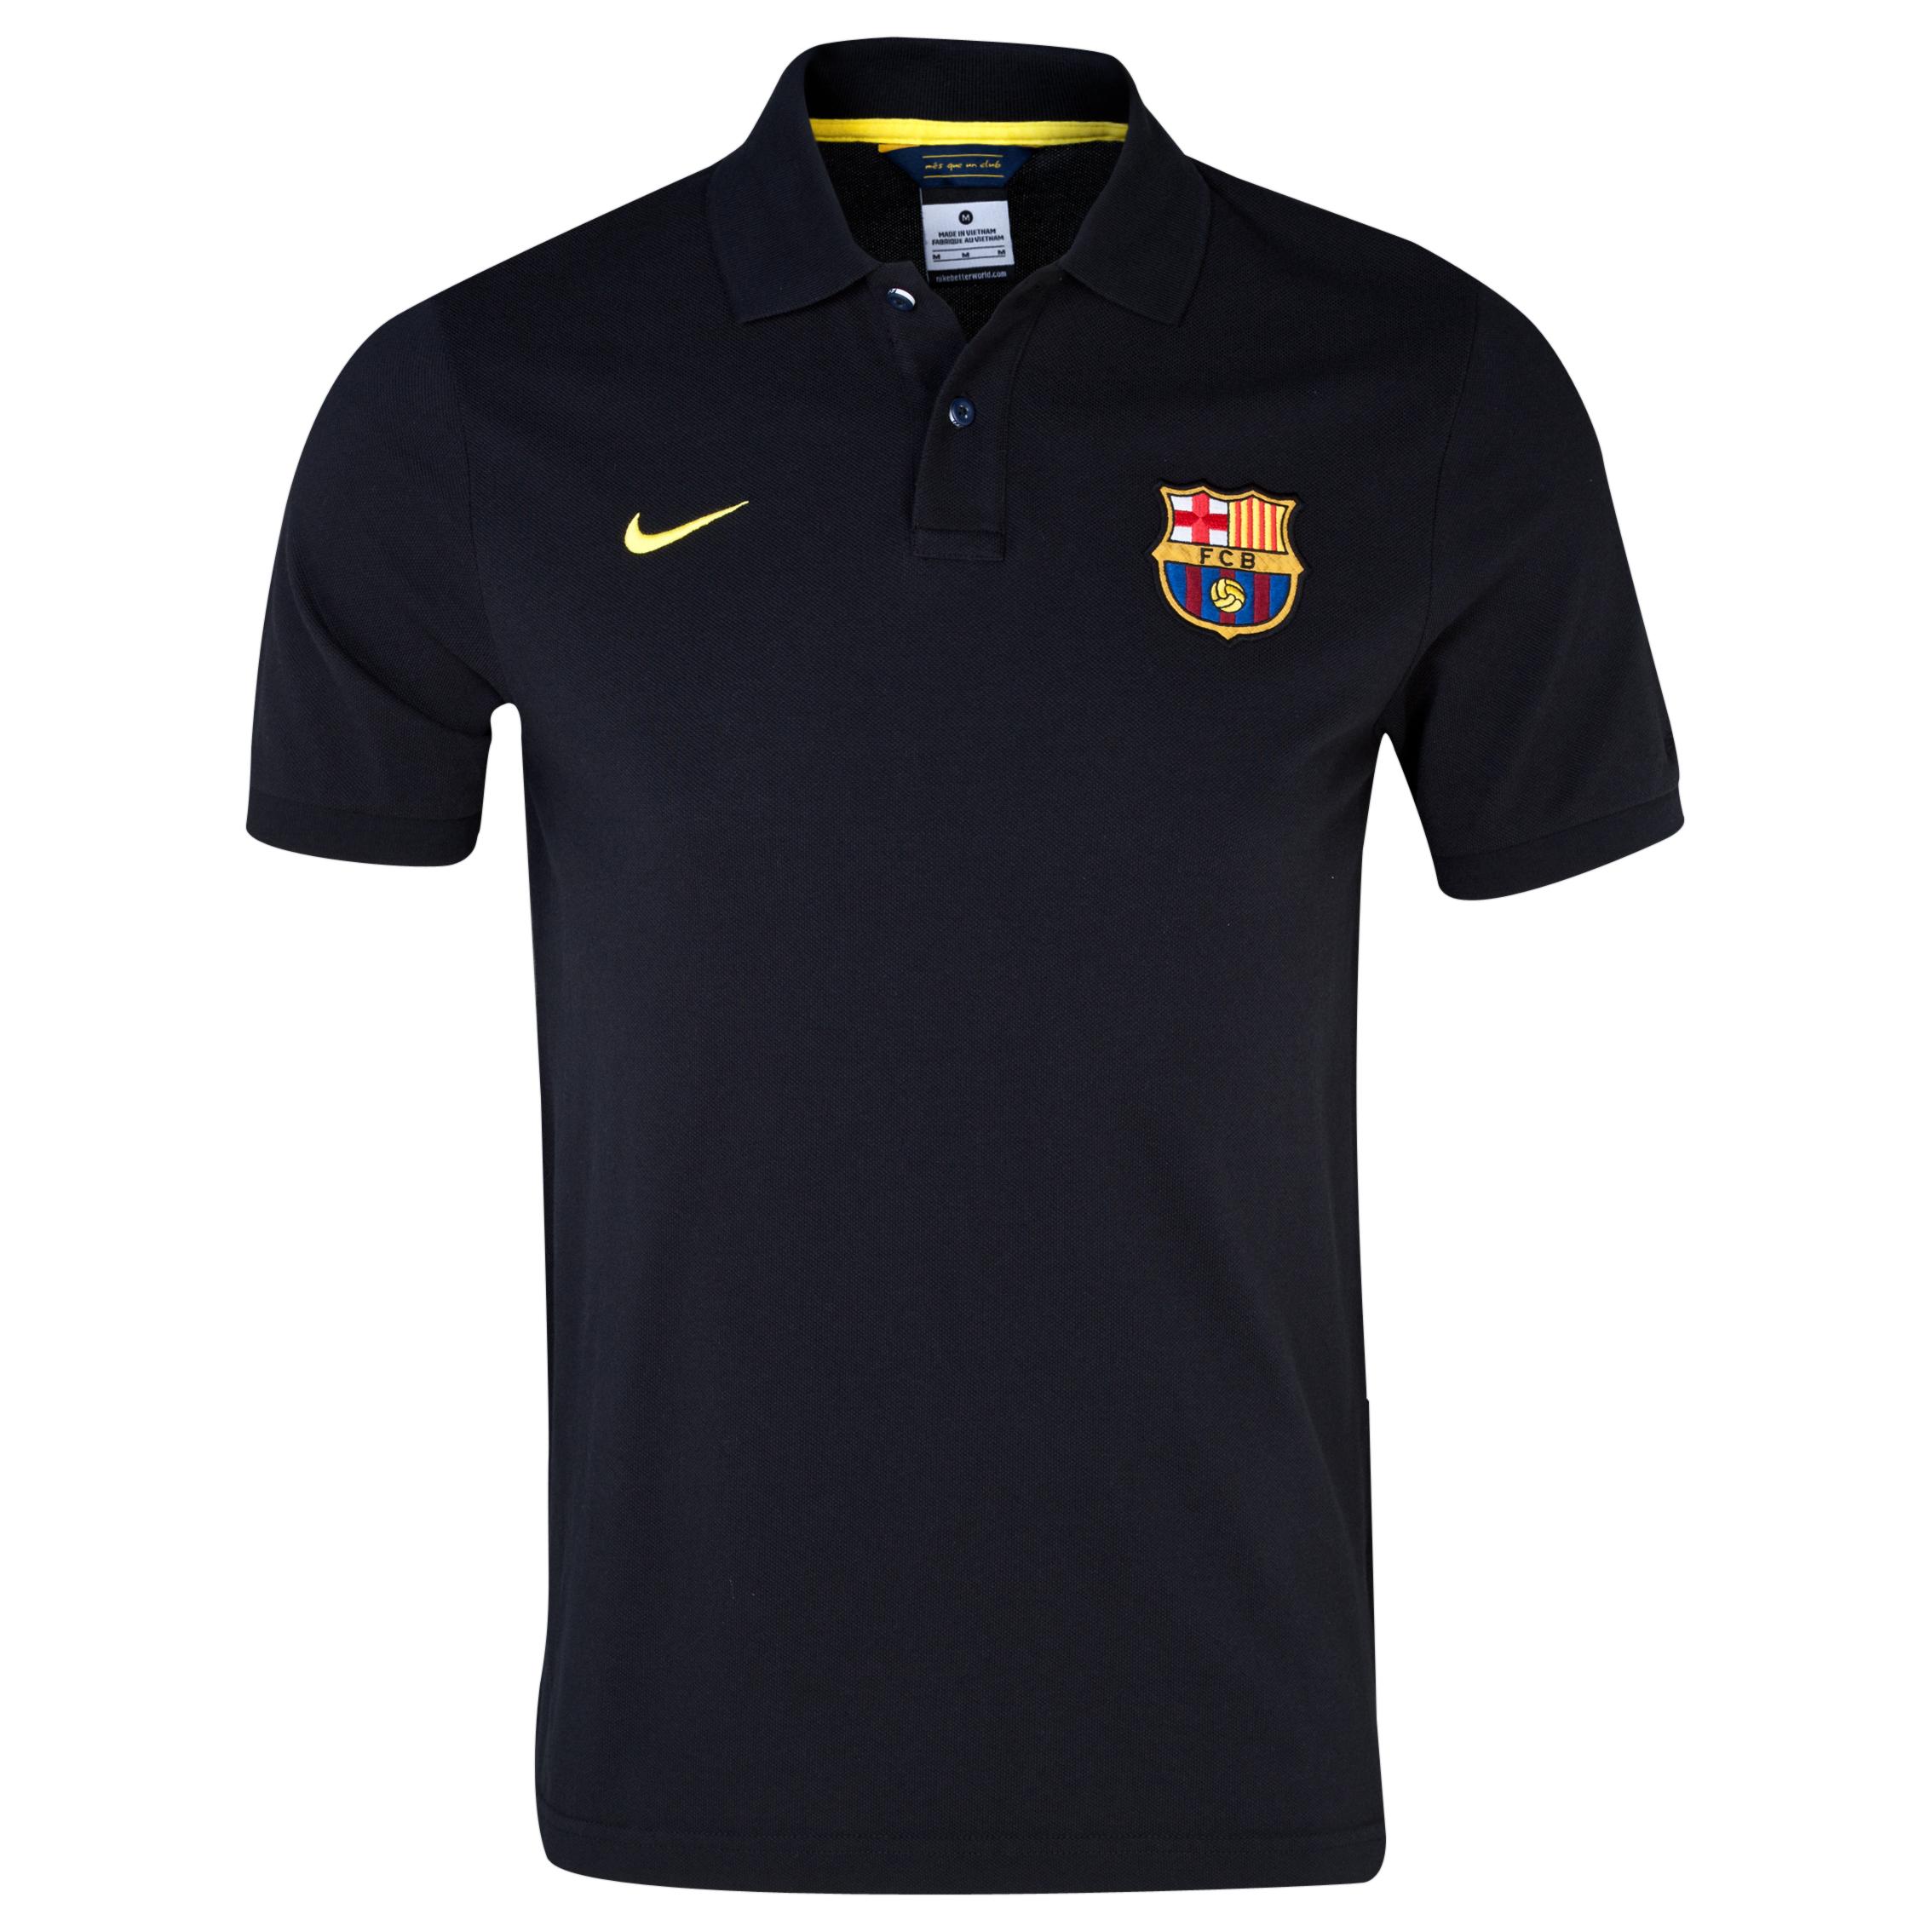 Barcelona Authentic Grand Slam Polo - Black/Vibrant Yellow Black